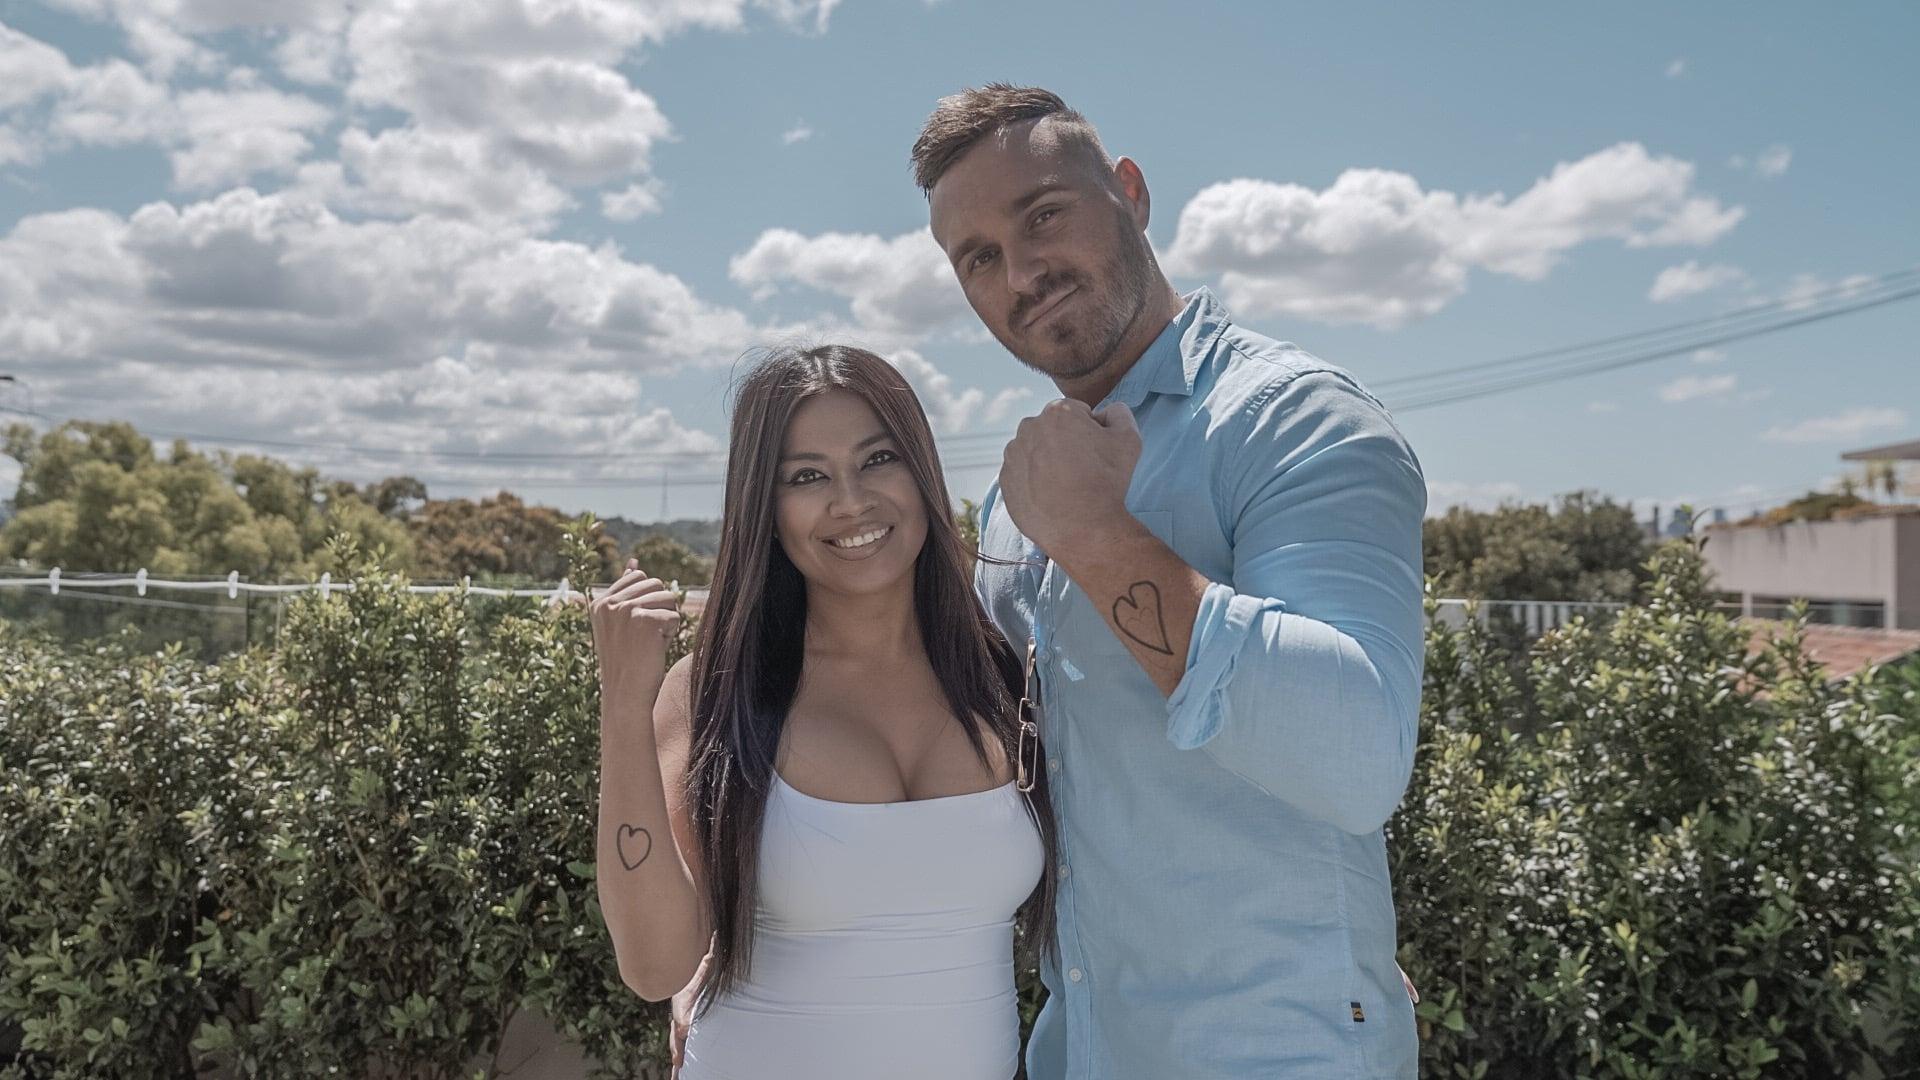 Cyrell Paule and Eden Dally Interview 2019 | POPSUGAR Celebrity Australia